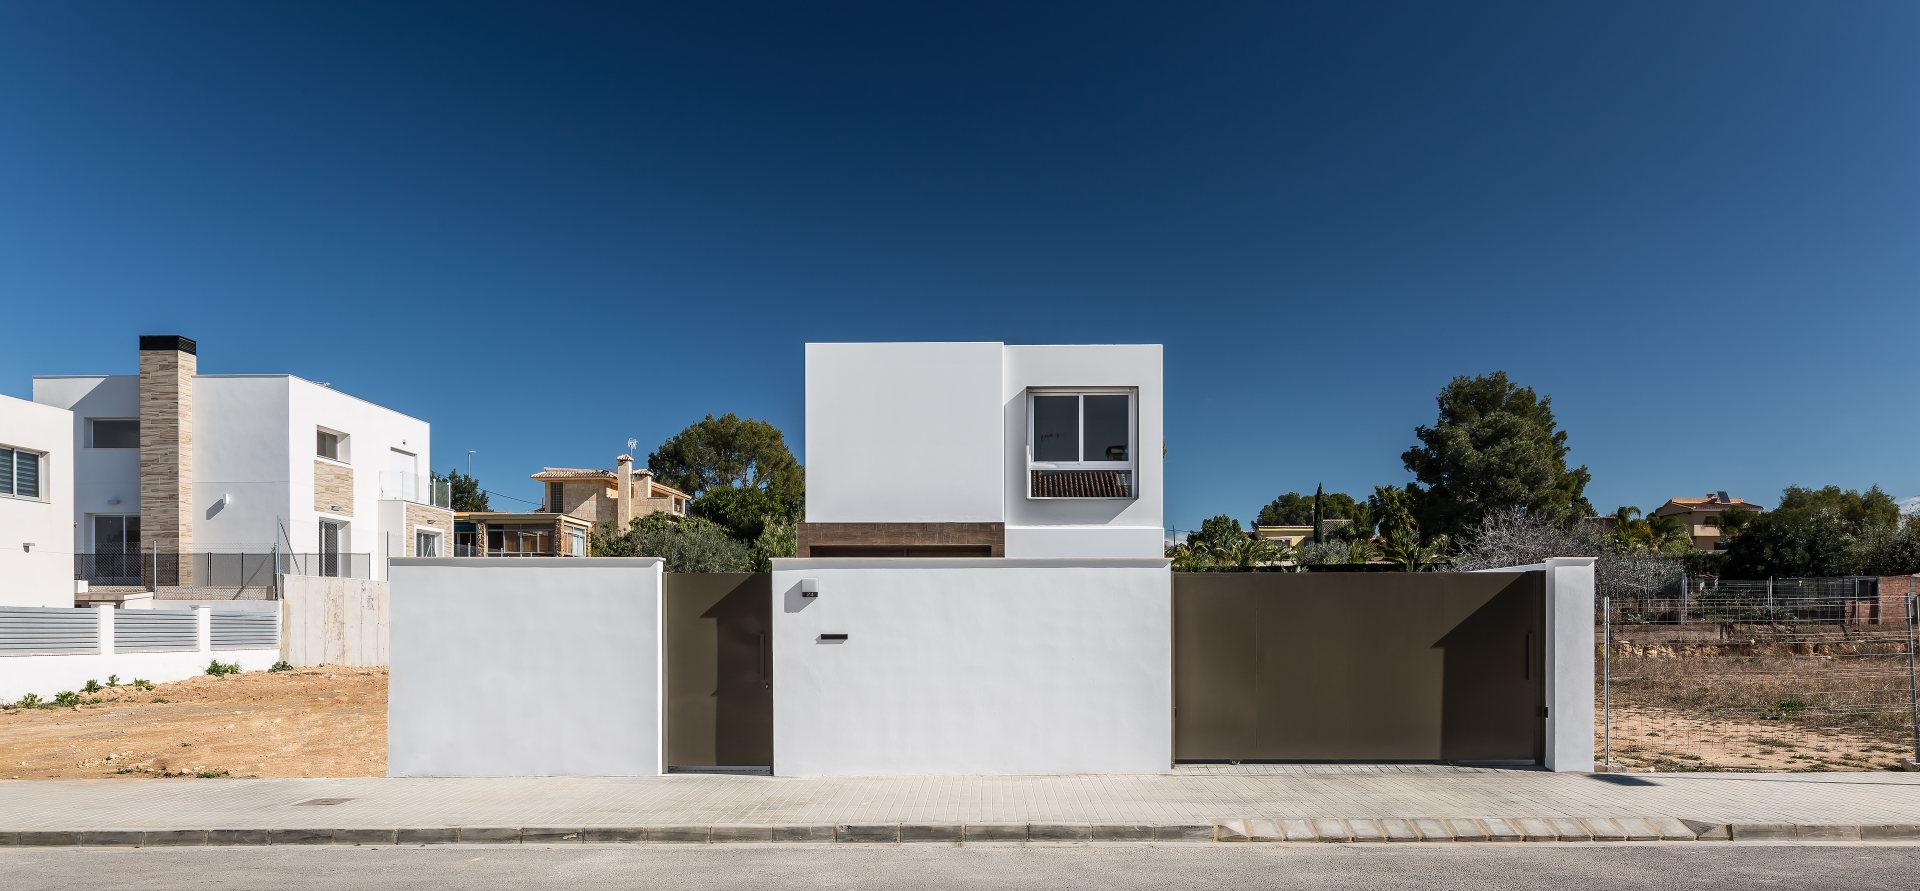 fotografia-arquitectura-valencia-german-cabo-viraje-san-antonio (1)